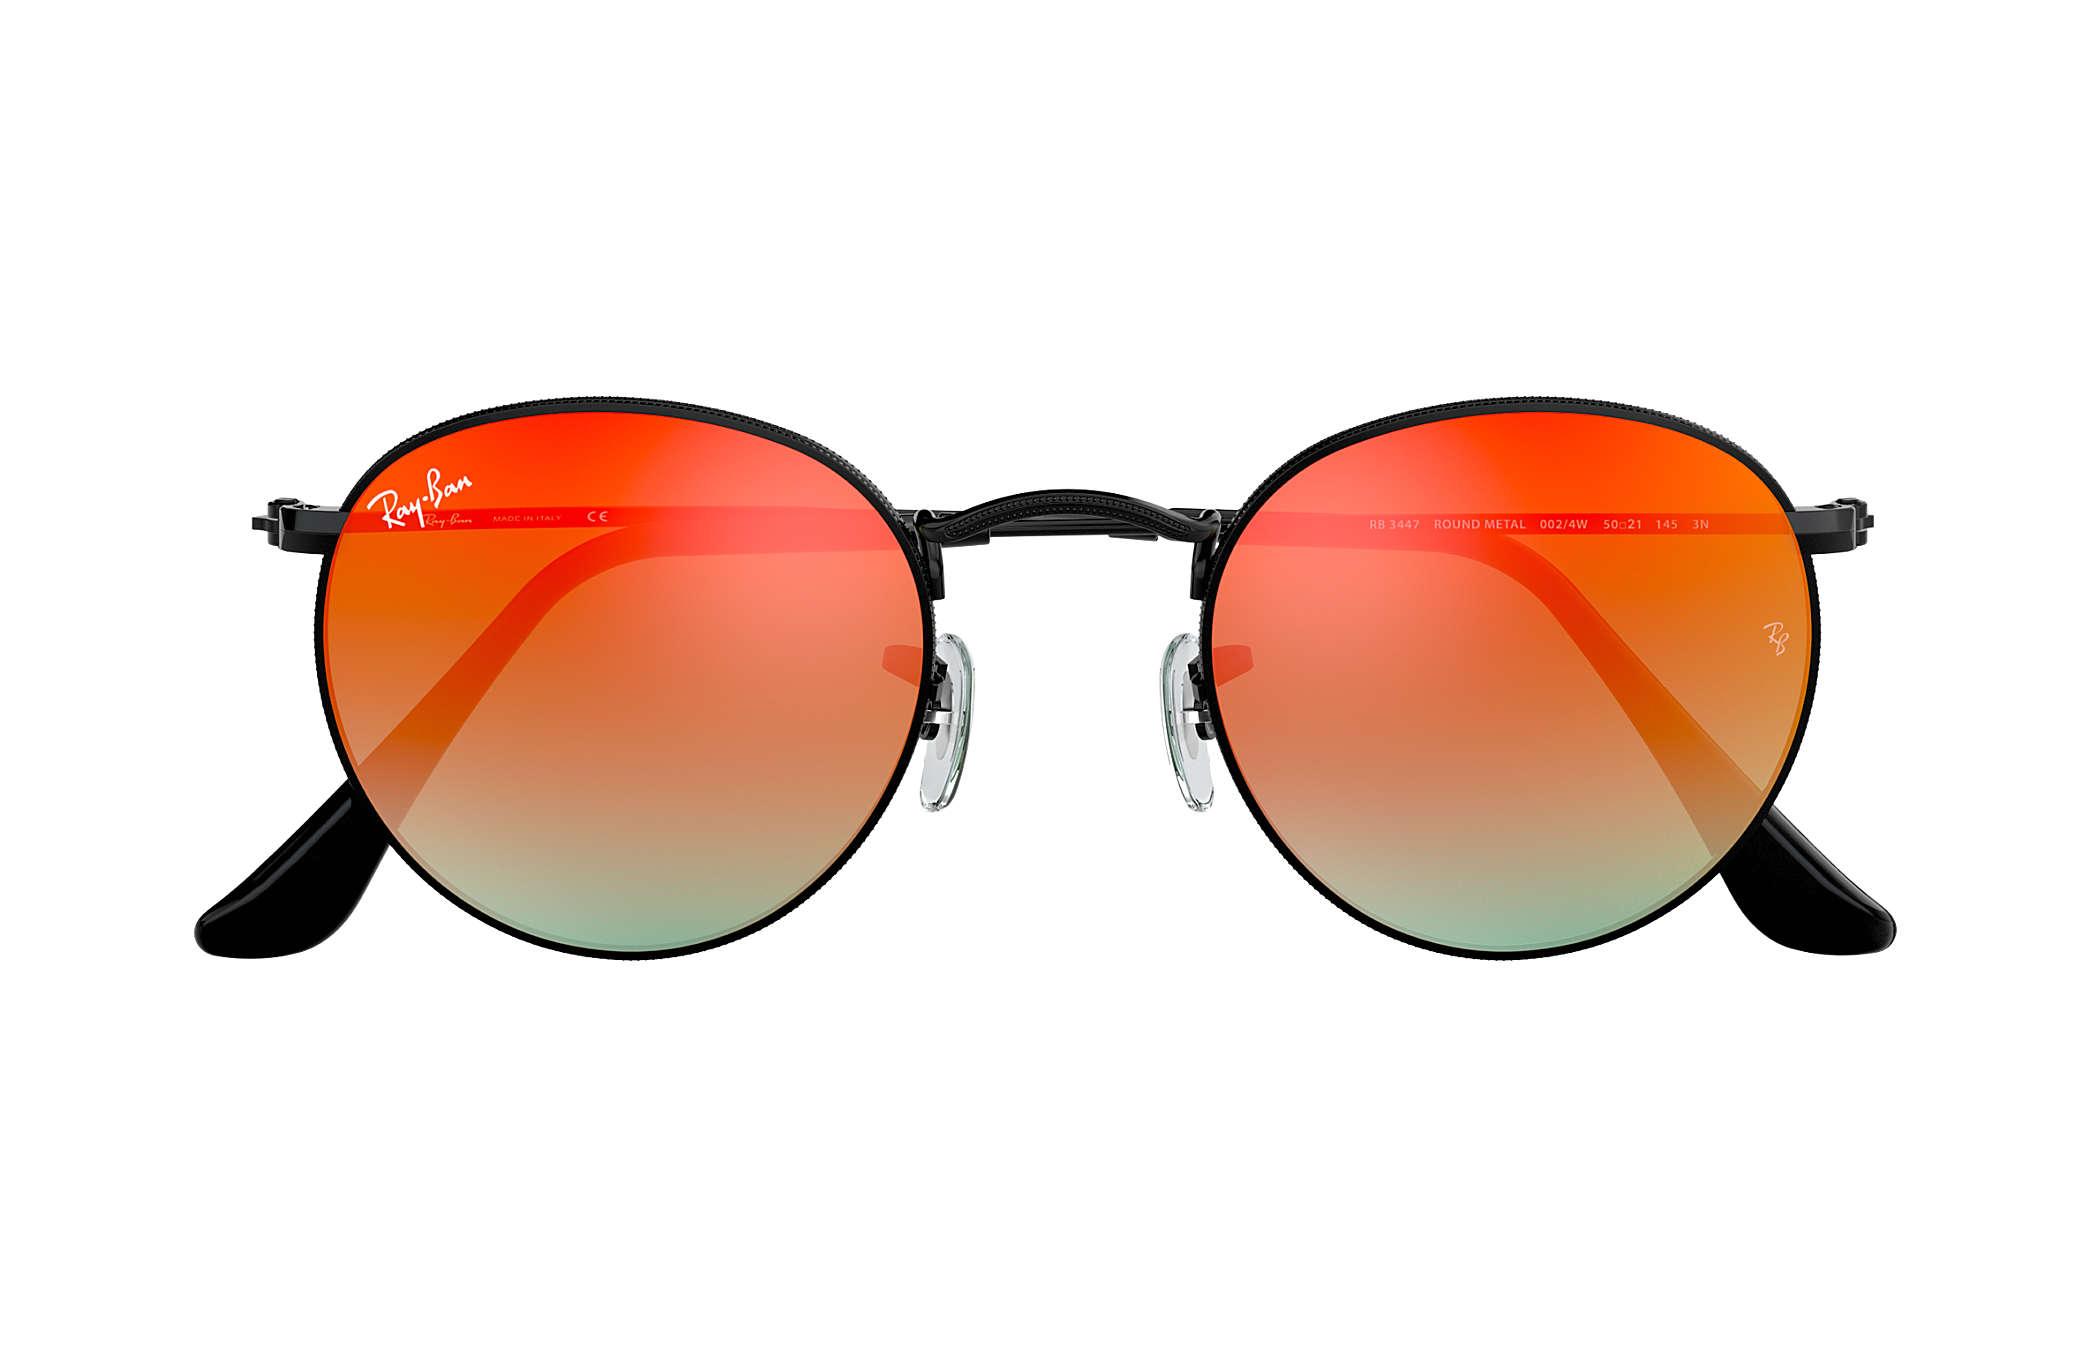 f15a3673f5fb Ray-Ban Round Flash Lenses Gradient RB3447 Black - Metal - Orange ...